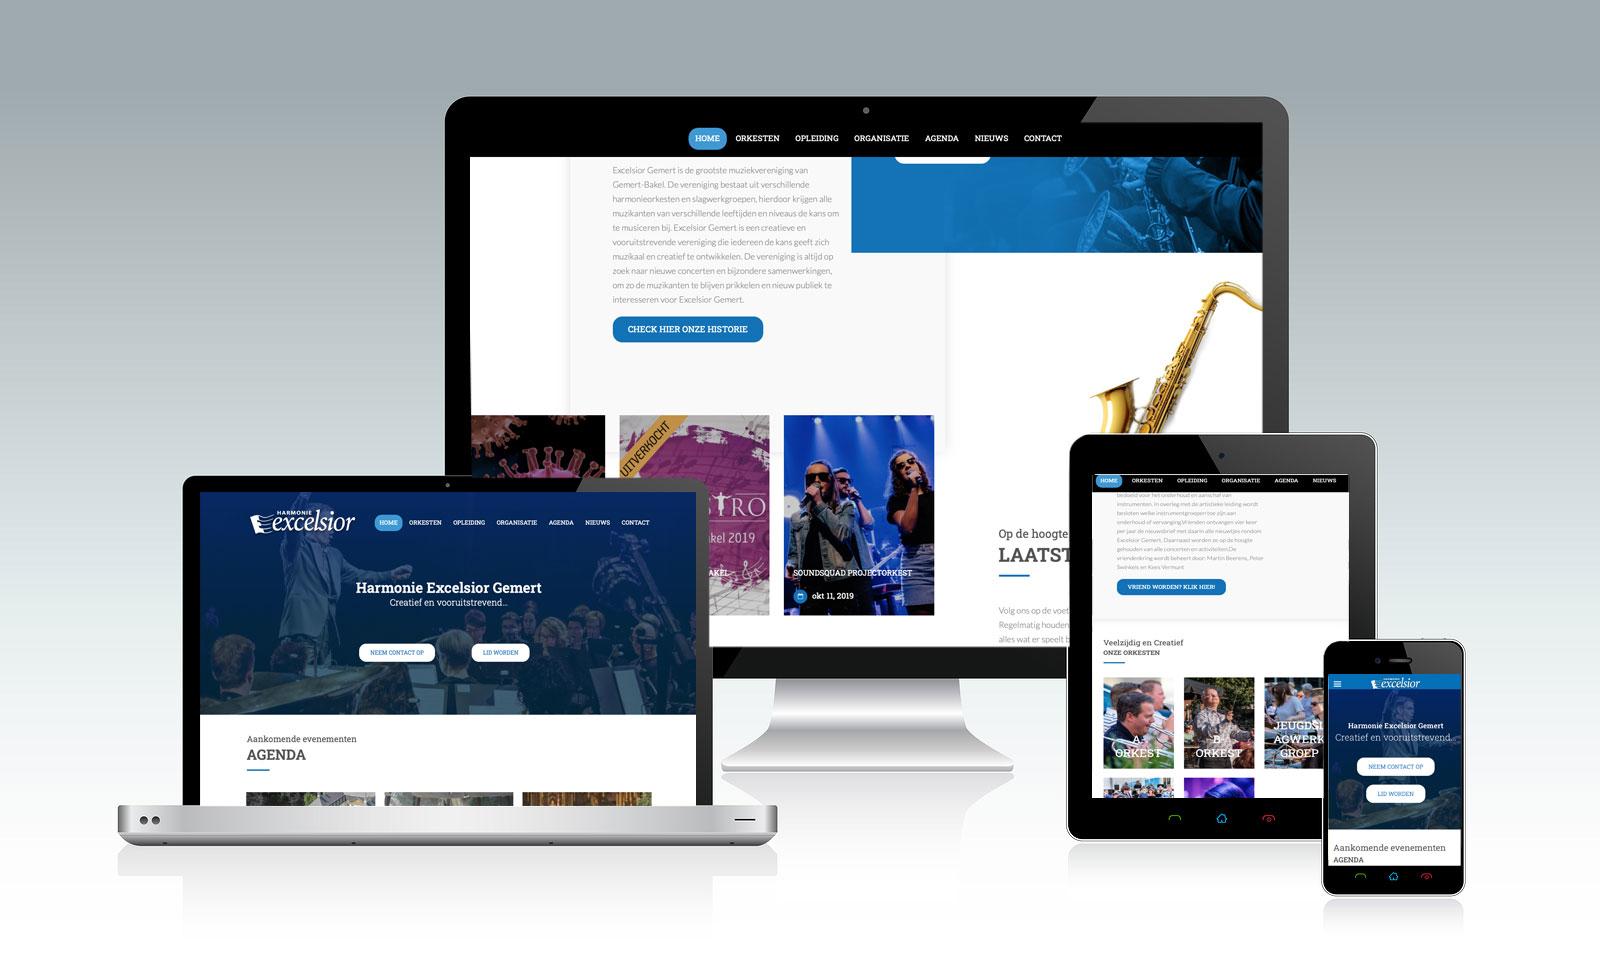 Website Harmonie Excelsior Gemert